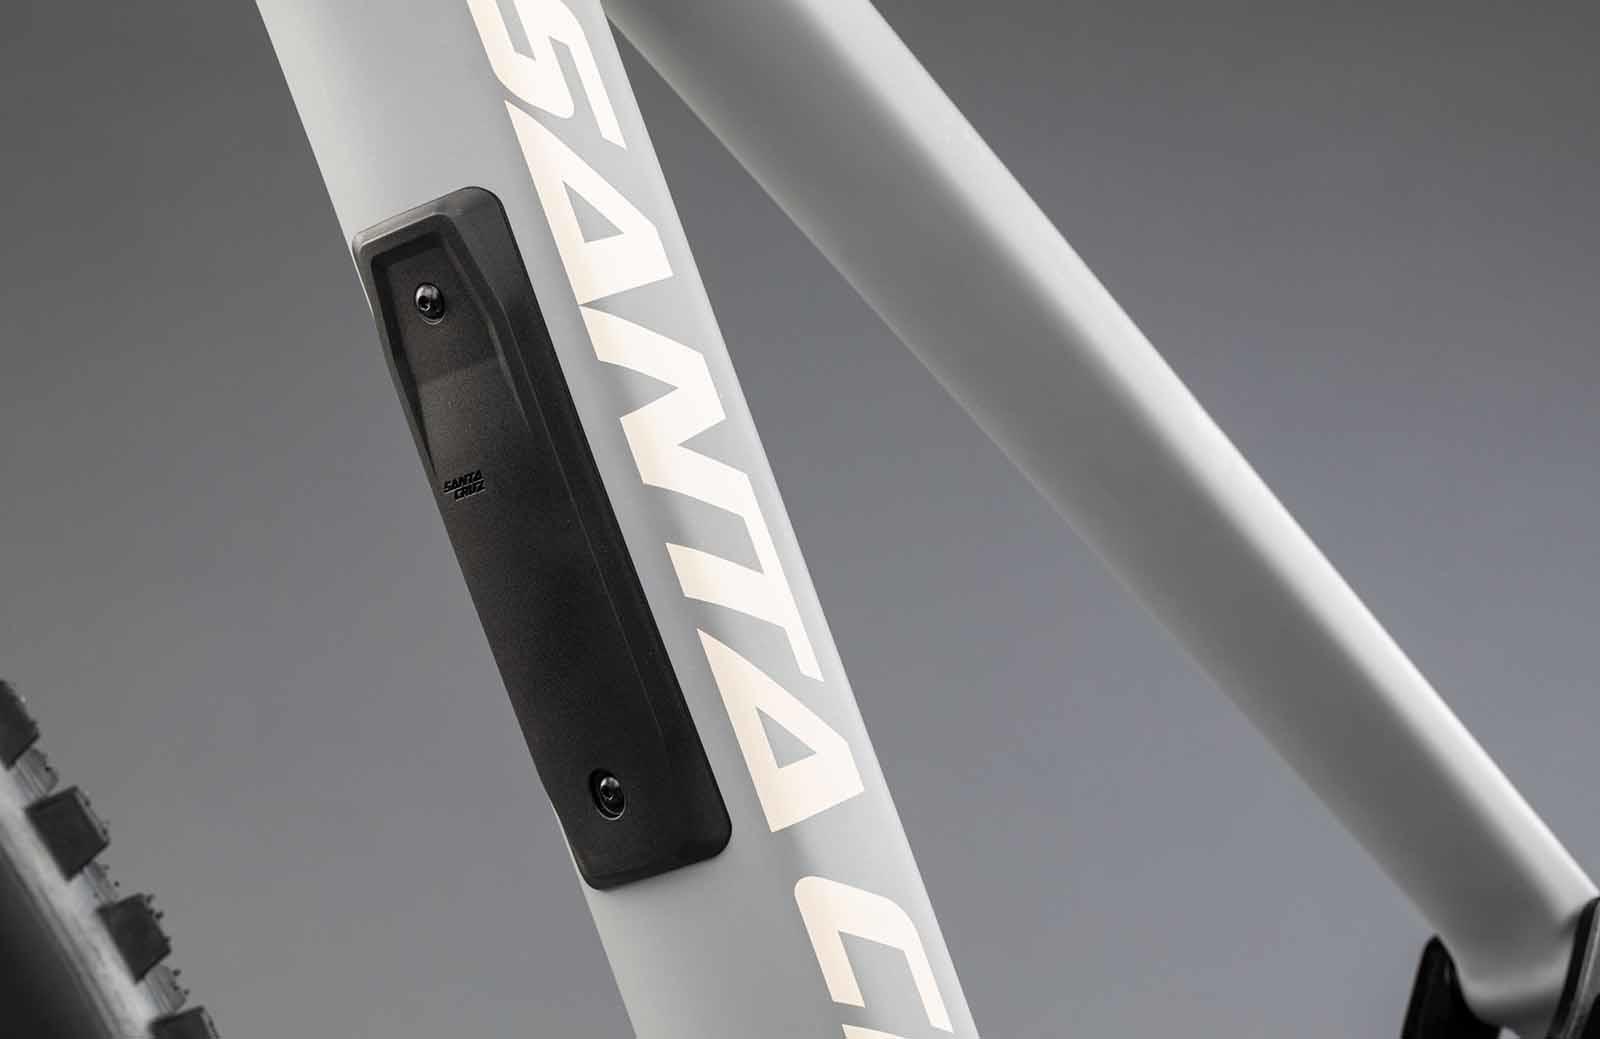 Santa Cruz Santa Cruz Hightower - R / Aluminum / 29 (2021)